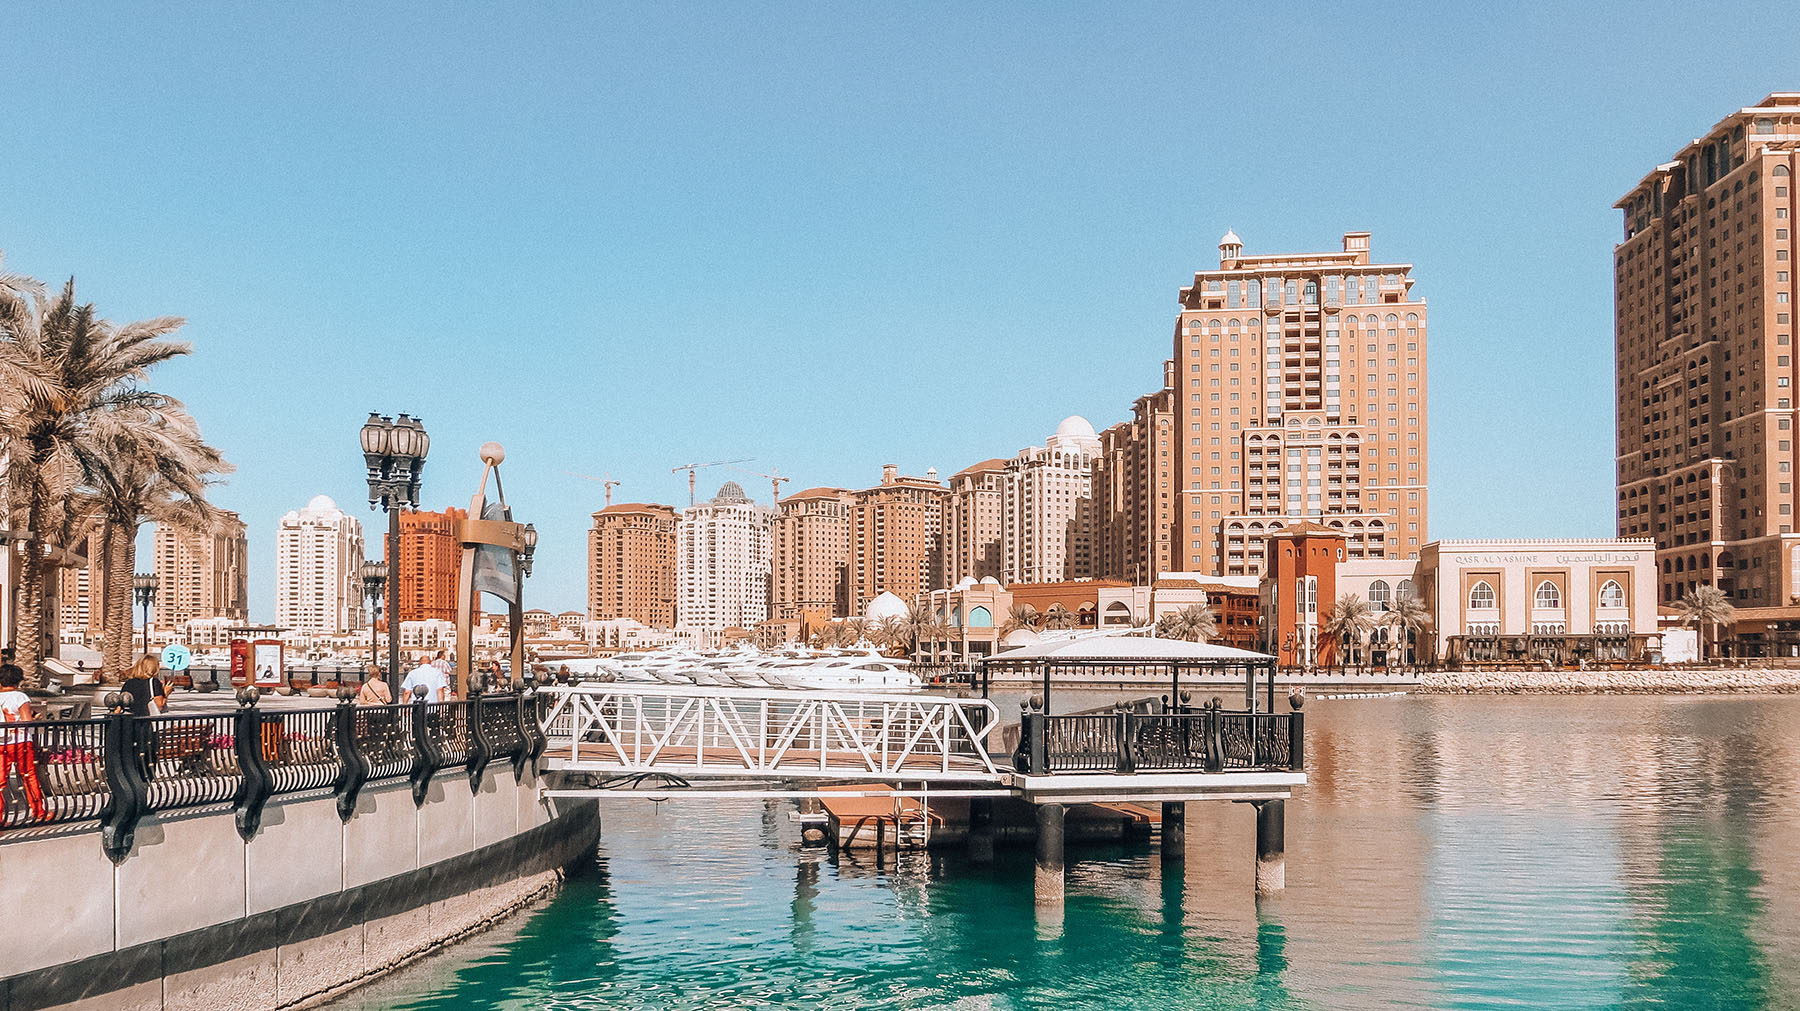 Orient Kreuzfahrt Doha Katar Ausflug The Pearl